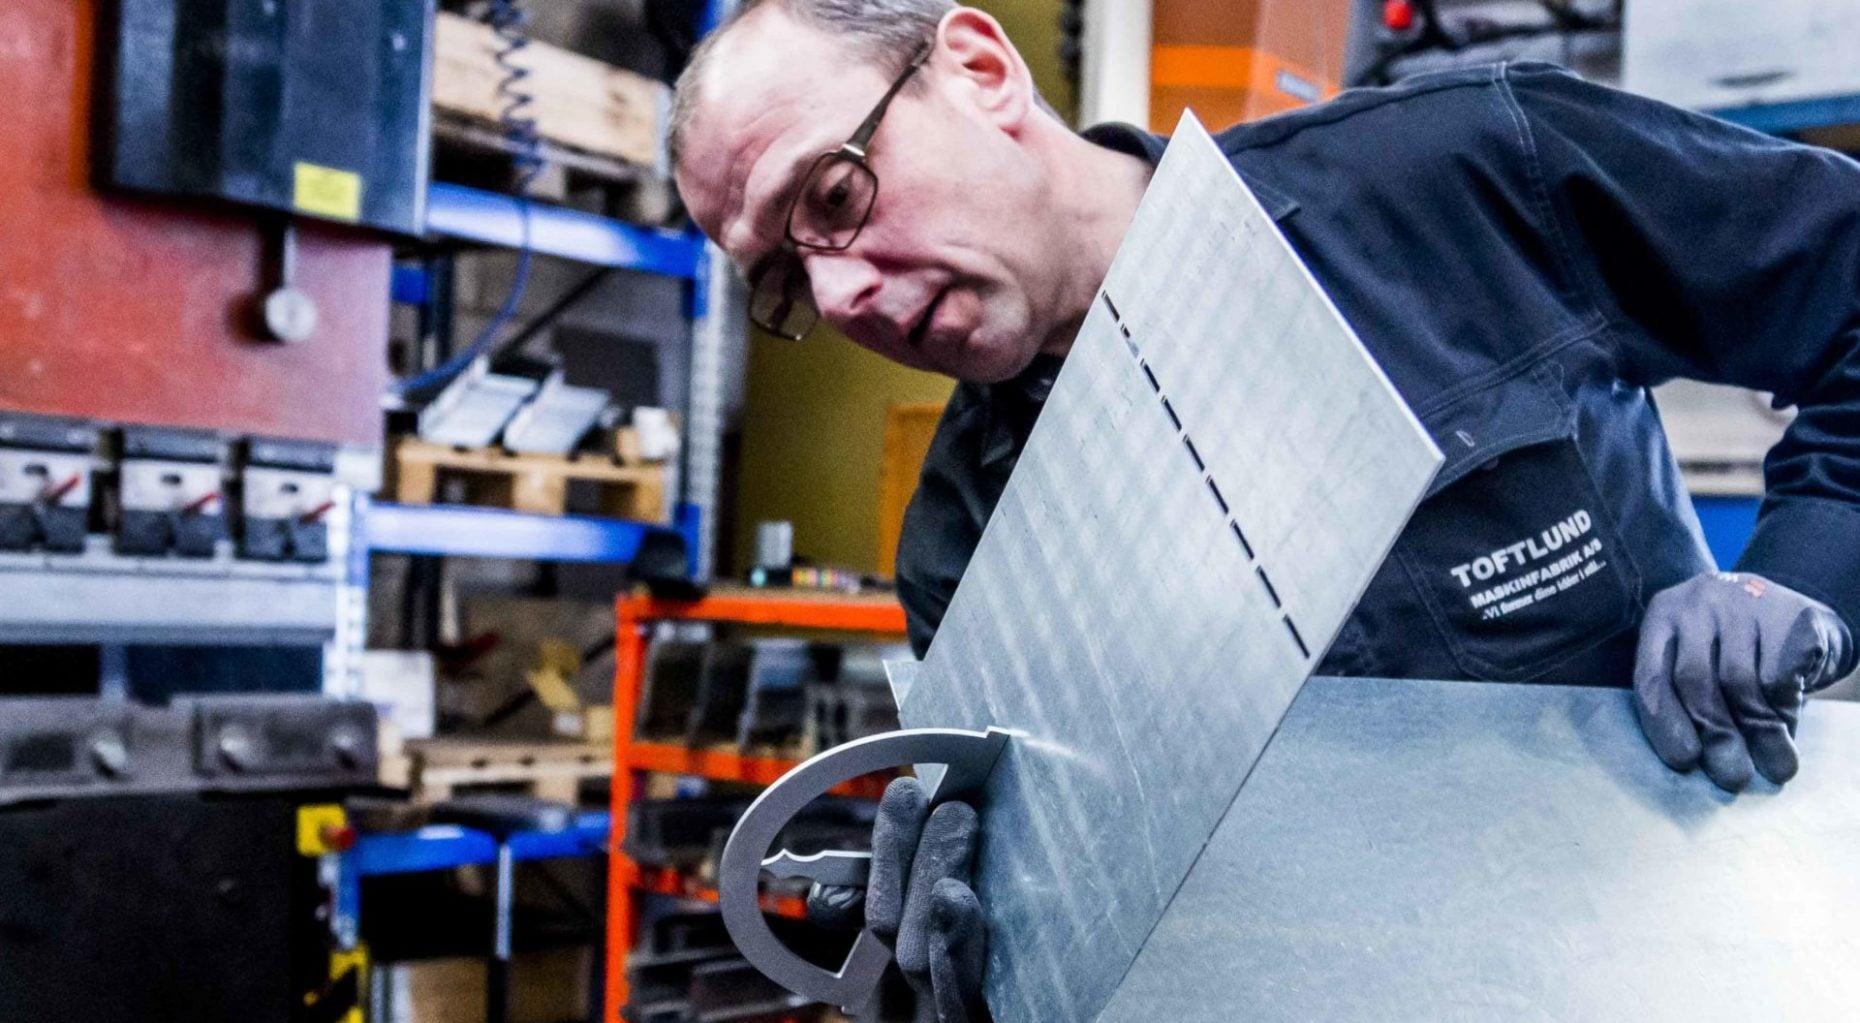 Webdesign Lennart C - Toftlund maskinfabrik Case